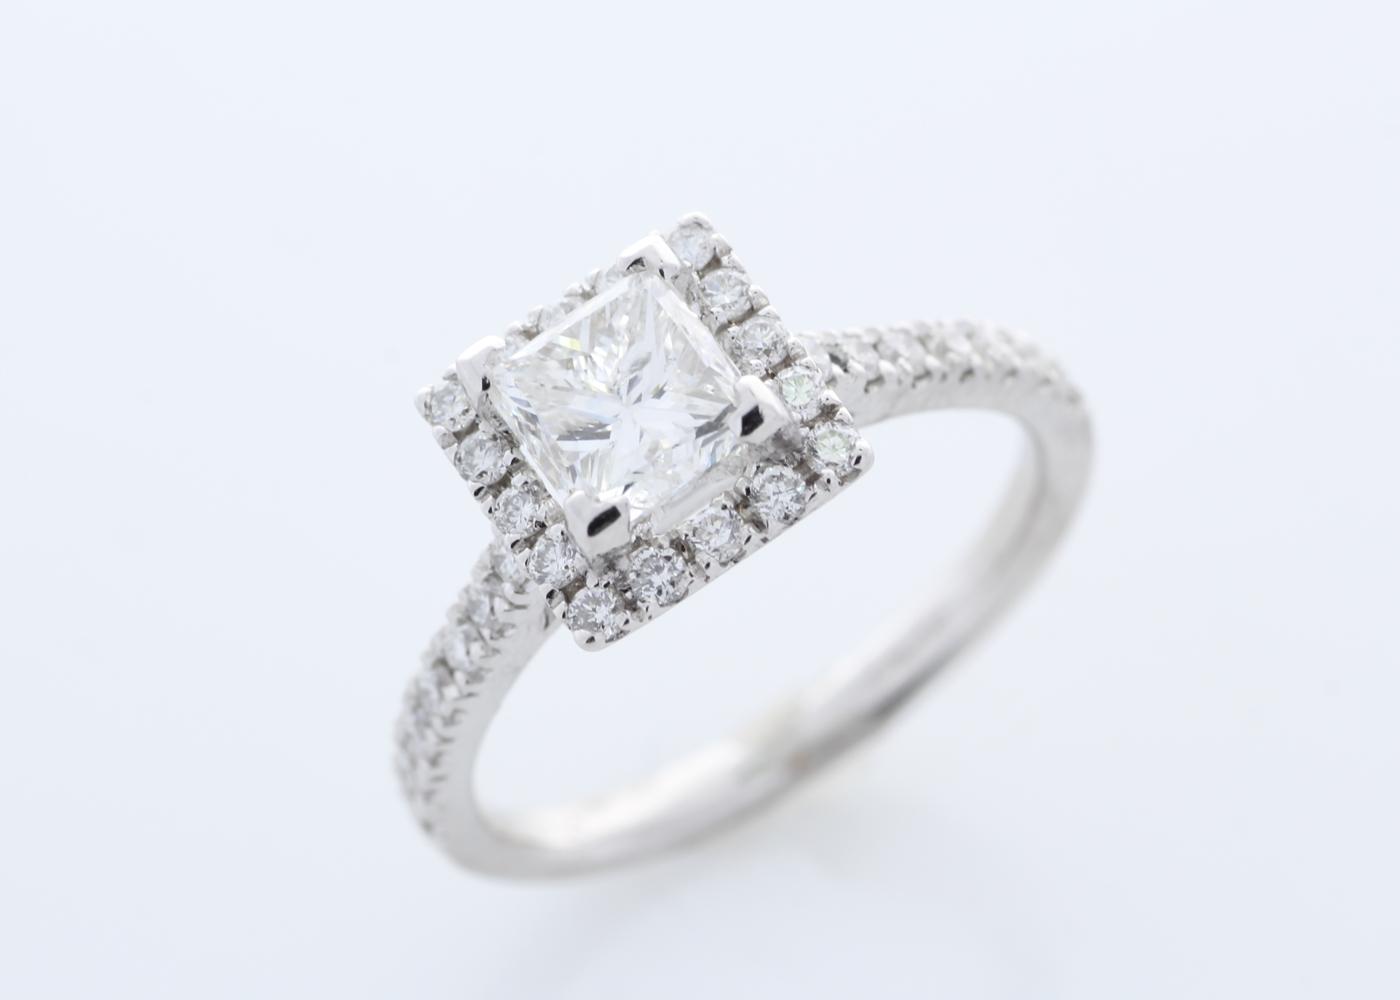 18ct White Gold Halo Set Princess Cut Diamond Ring 1.36 Carats - Image 5 of 6